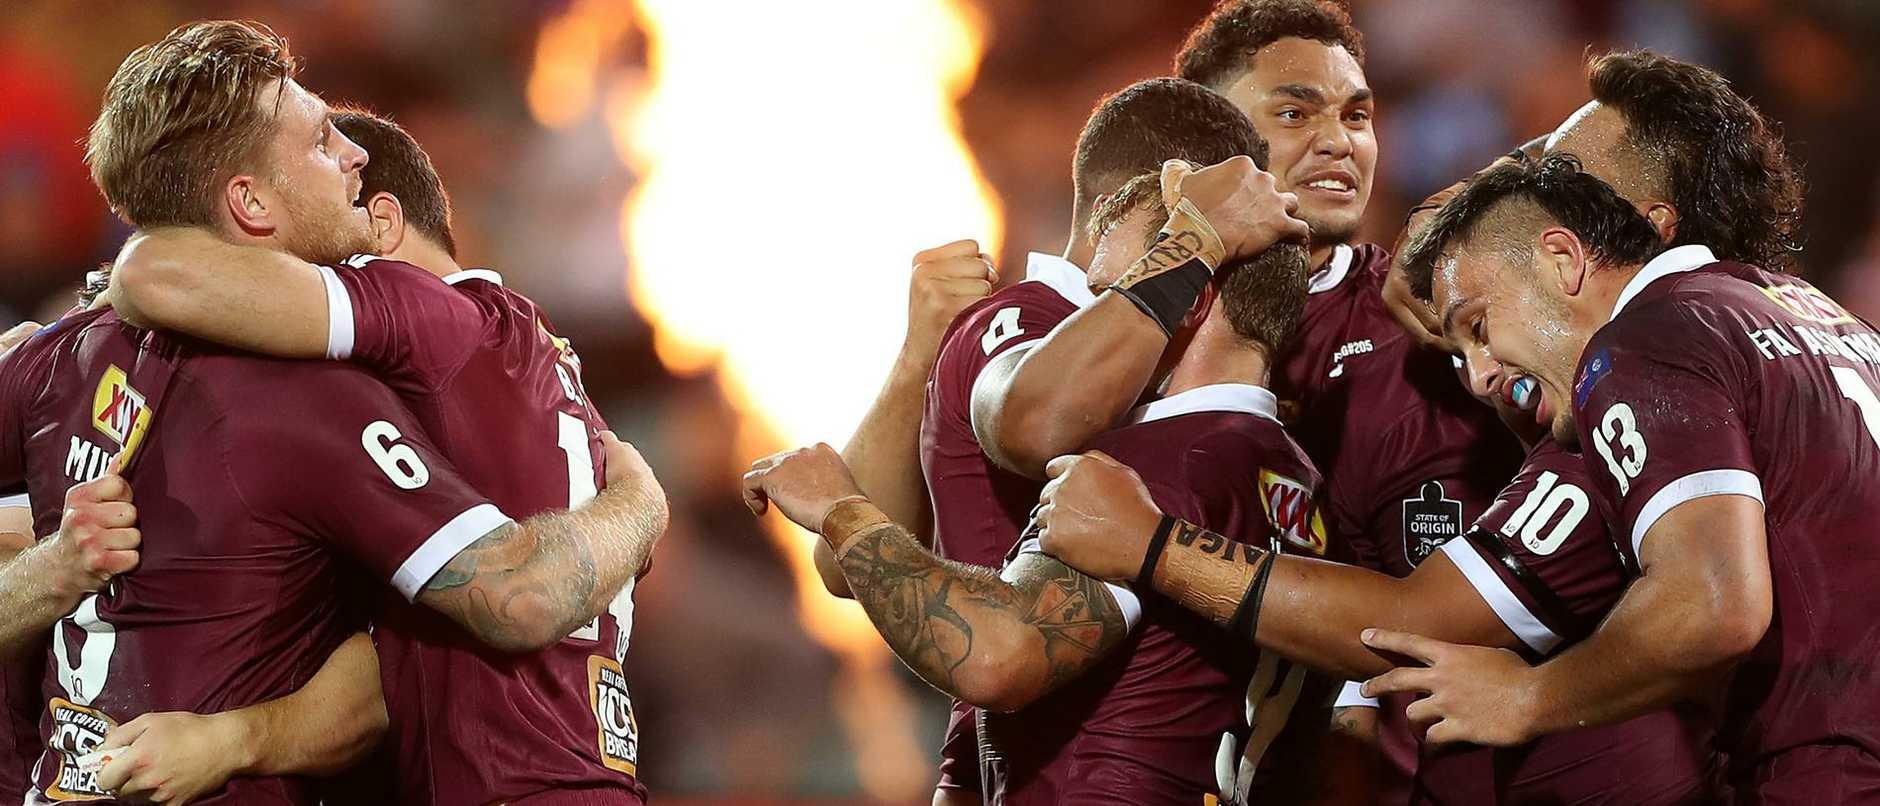 BESTPIX - State of Origin - QLD v NSW: Game 1